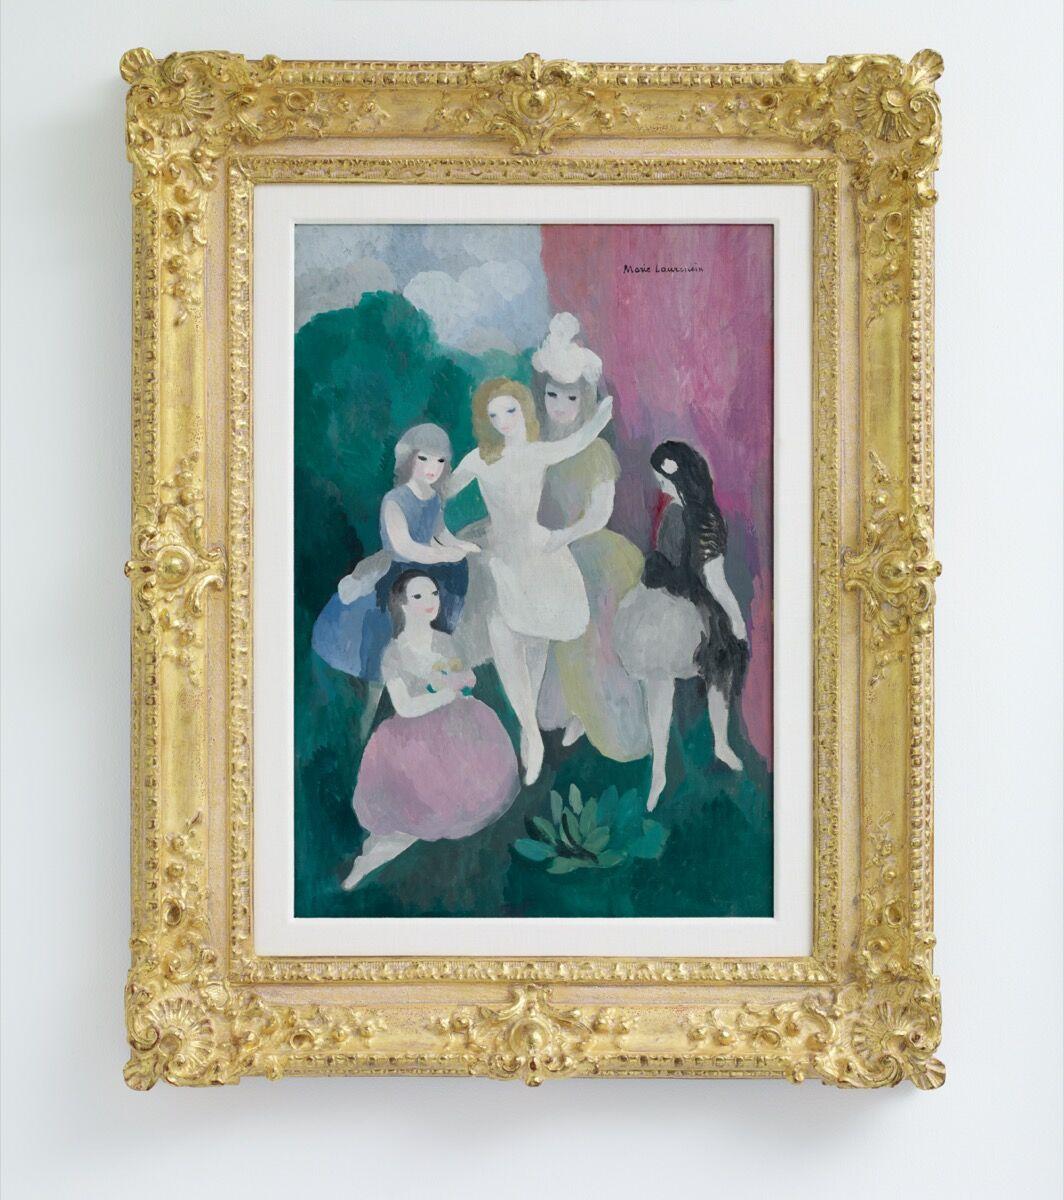 Marie Laurencin, Jeune Danseuses, c. 1925. © 2020 Artists Rights Society (ARS), New York / ADAGP, Paris. Courtesy of Nahmad Projects.